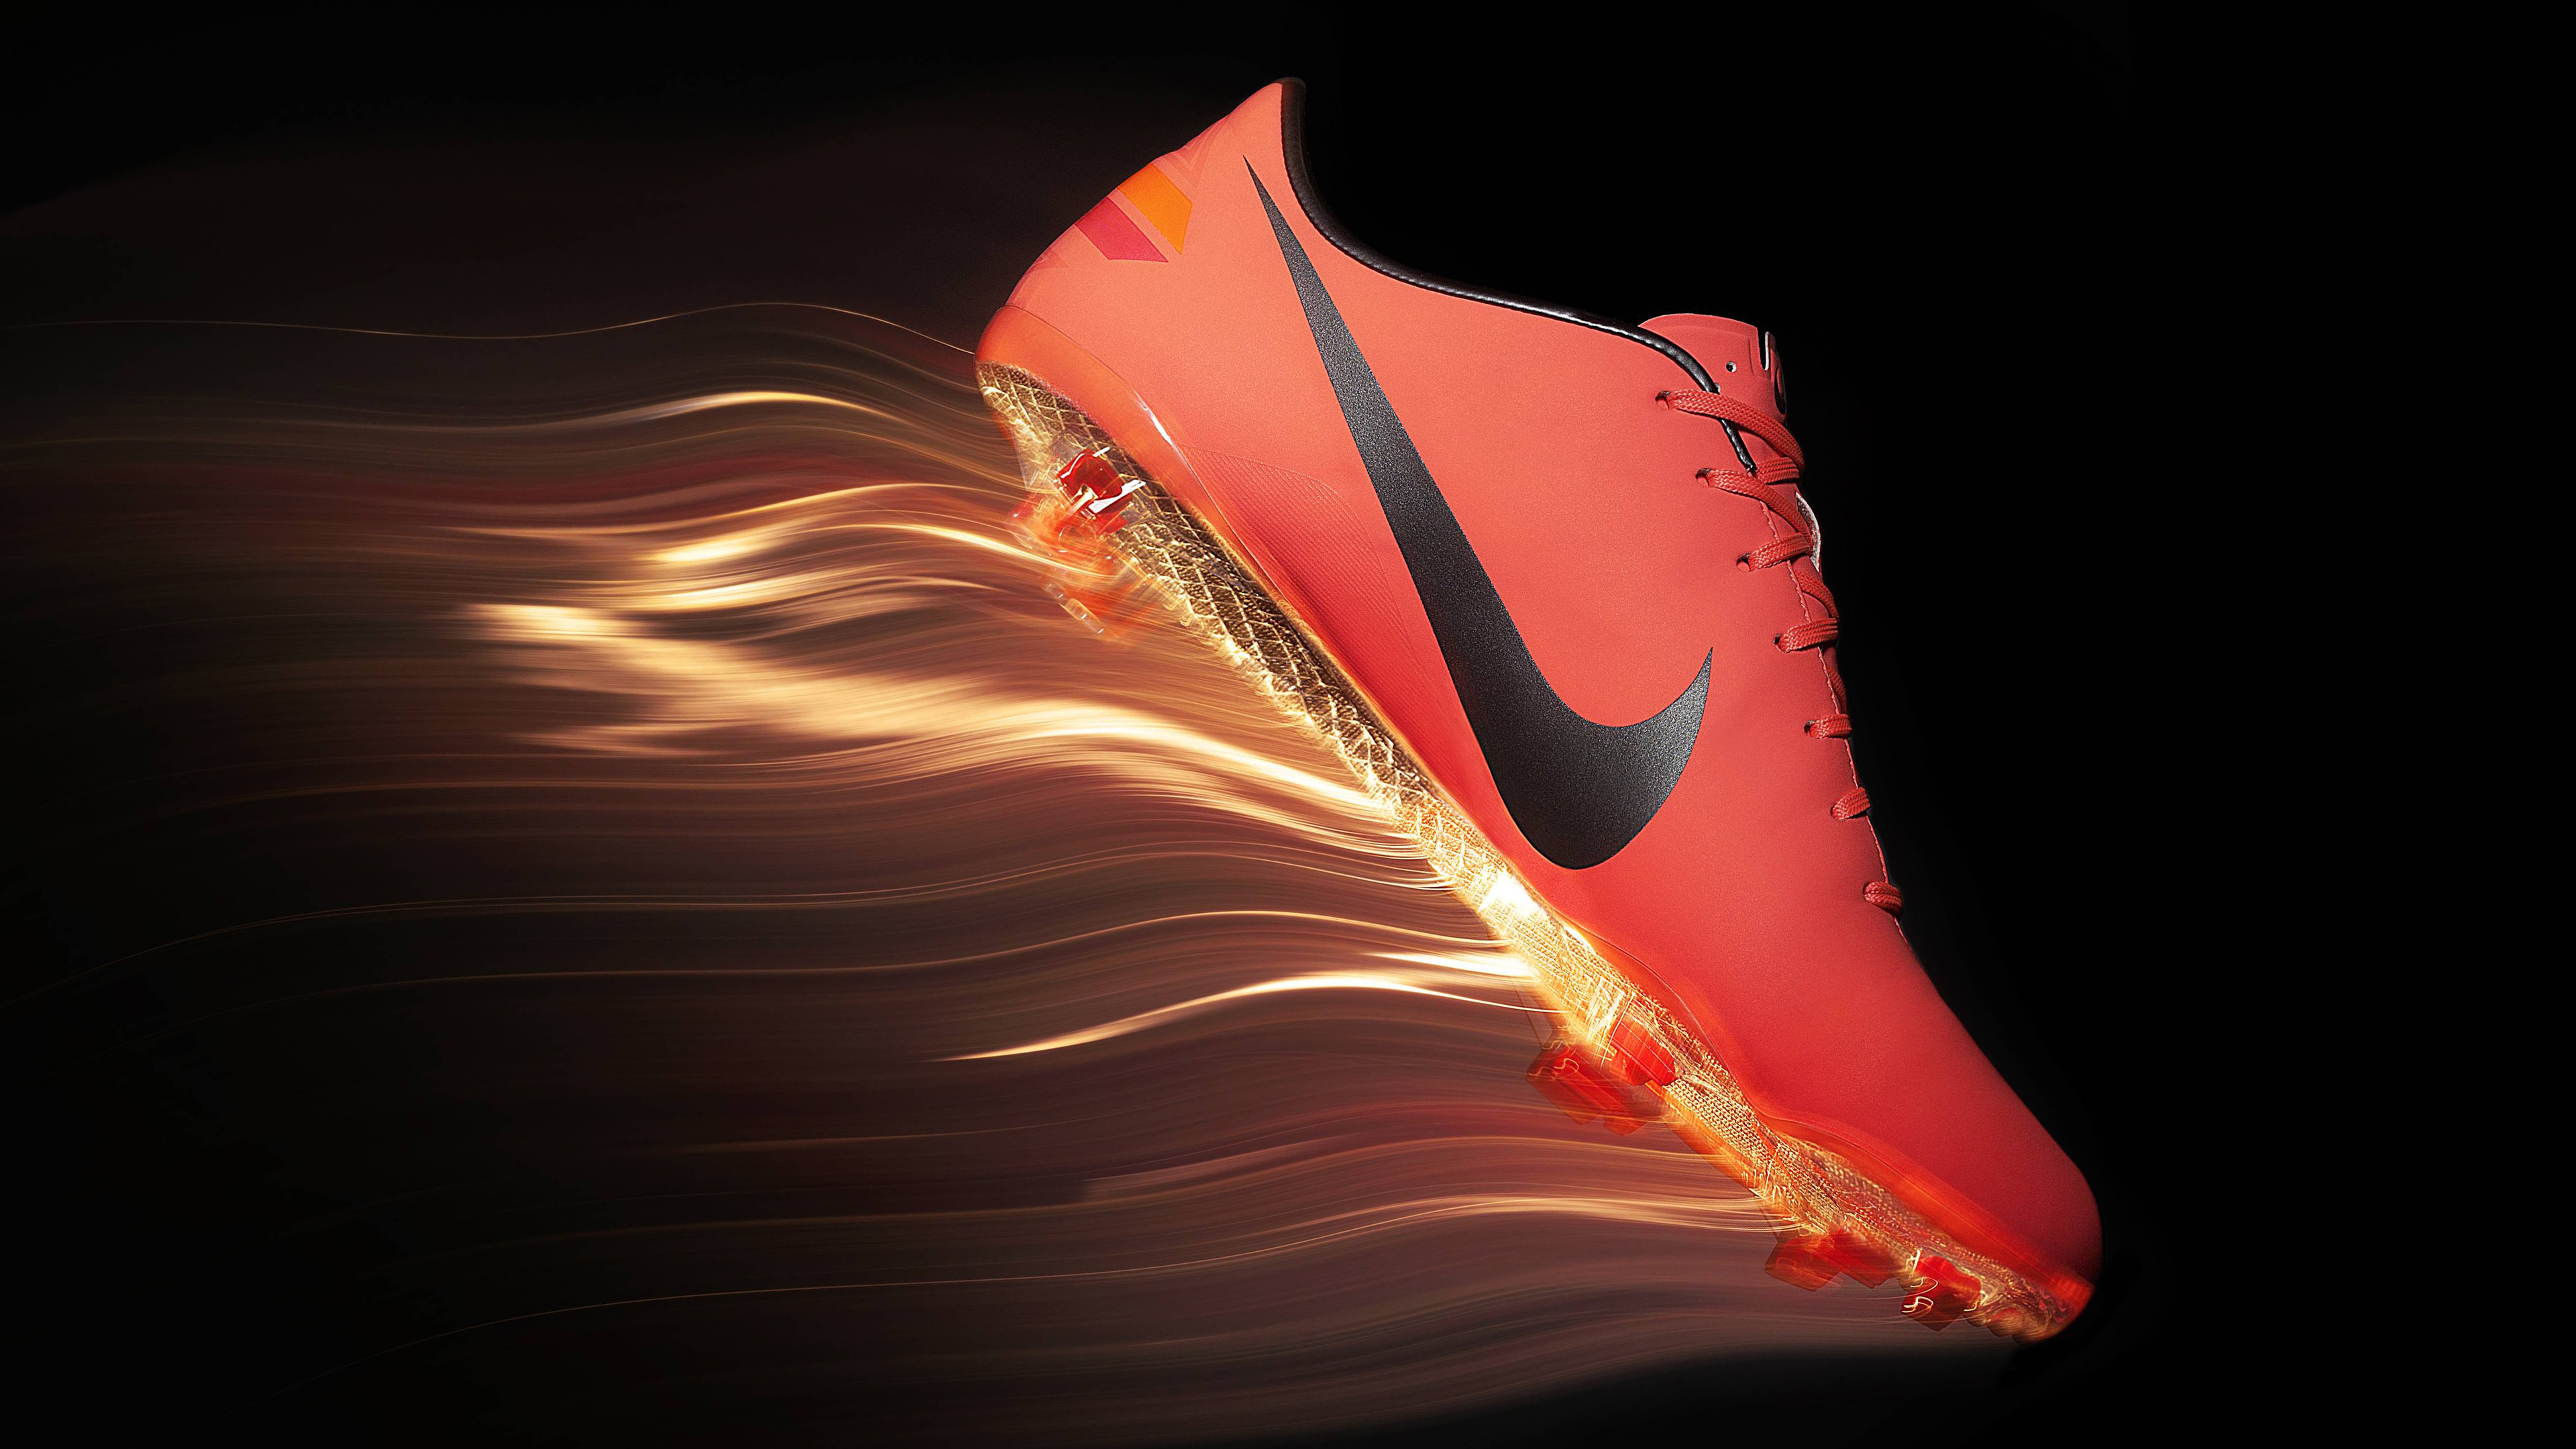 Nike Basketball Shoes Wallpaper 67 Images